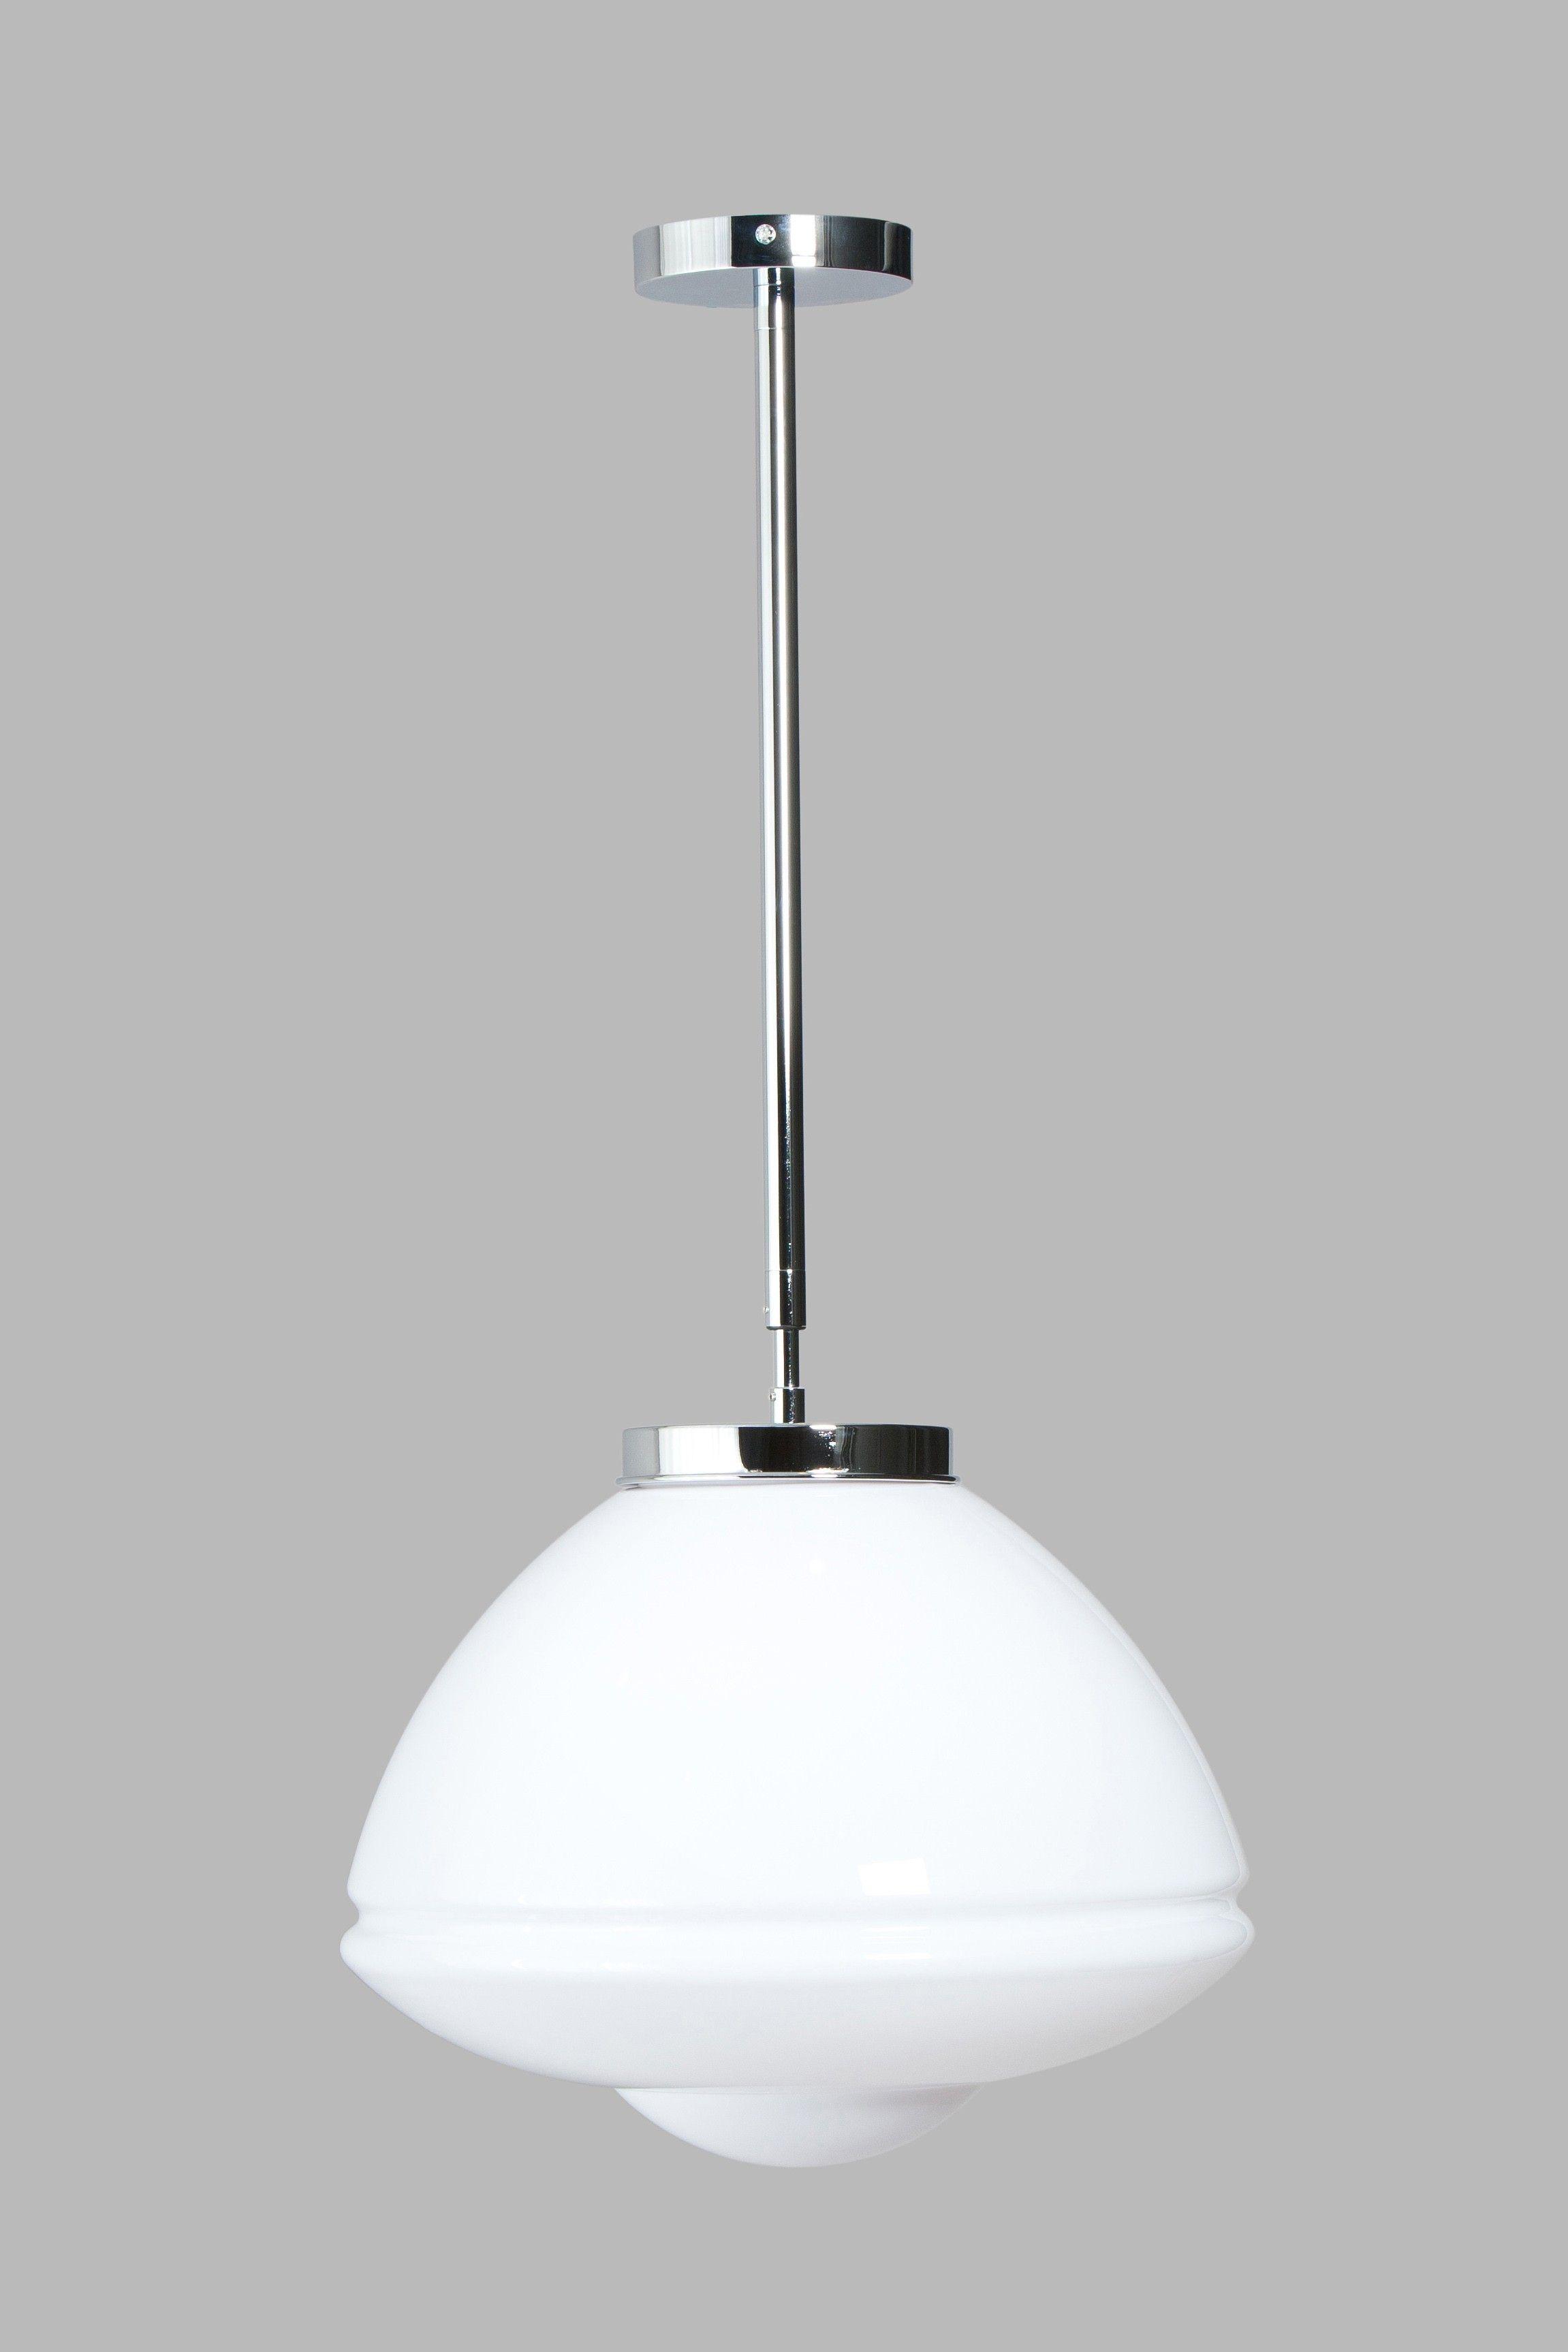 Lamp jaren 30 keuken of badkamer | Light | Pinterest | Bungalow ...